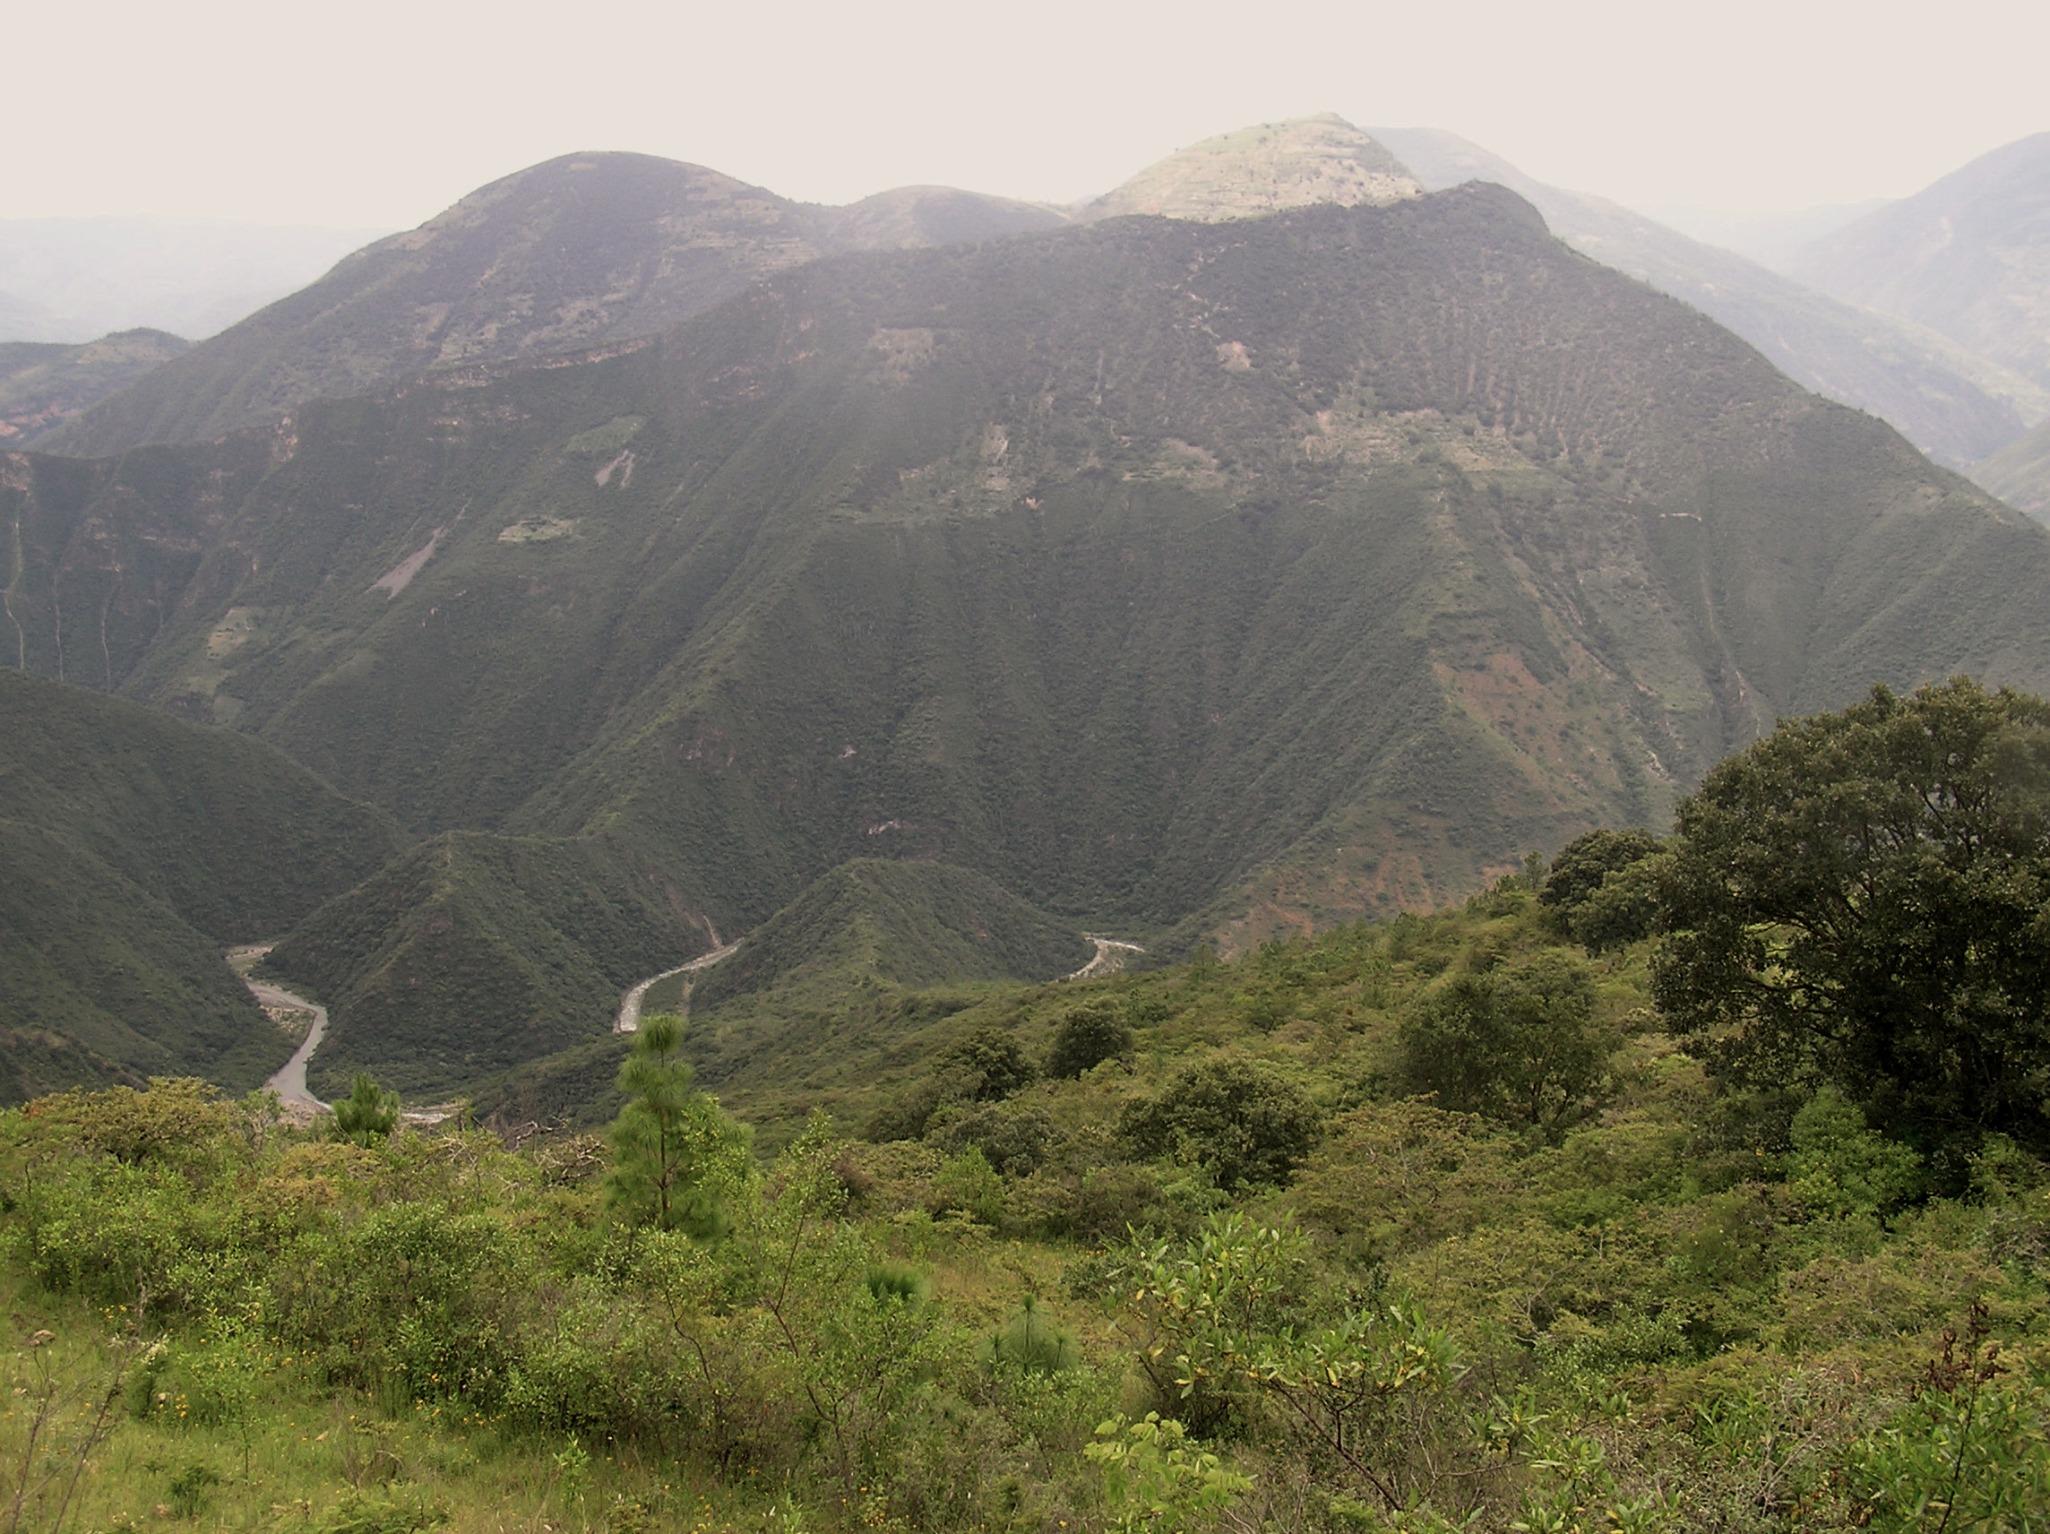 Analco-oaxaca-certificacion forestal-productos forestales certificados-manejo forestal comunitario-mexico